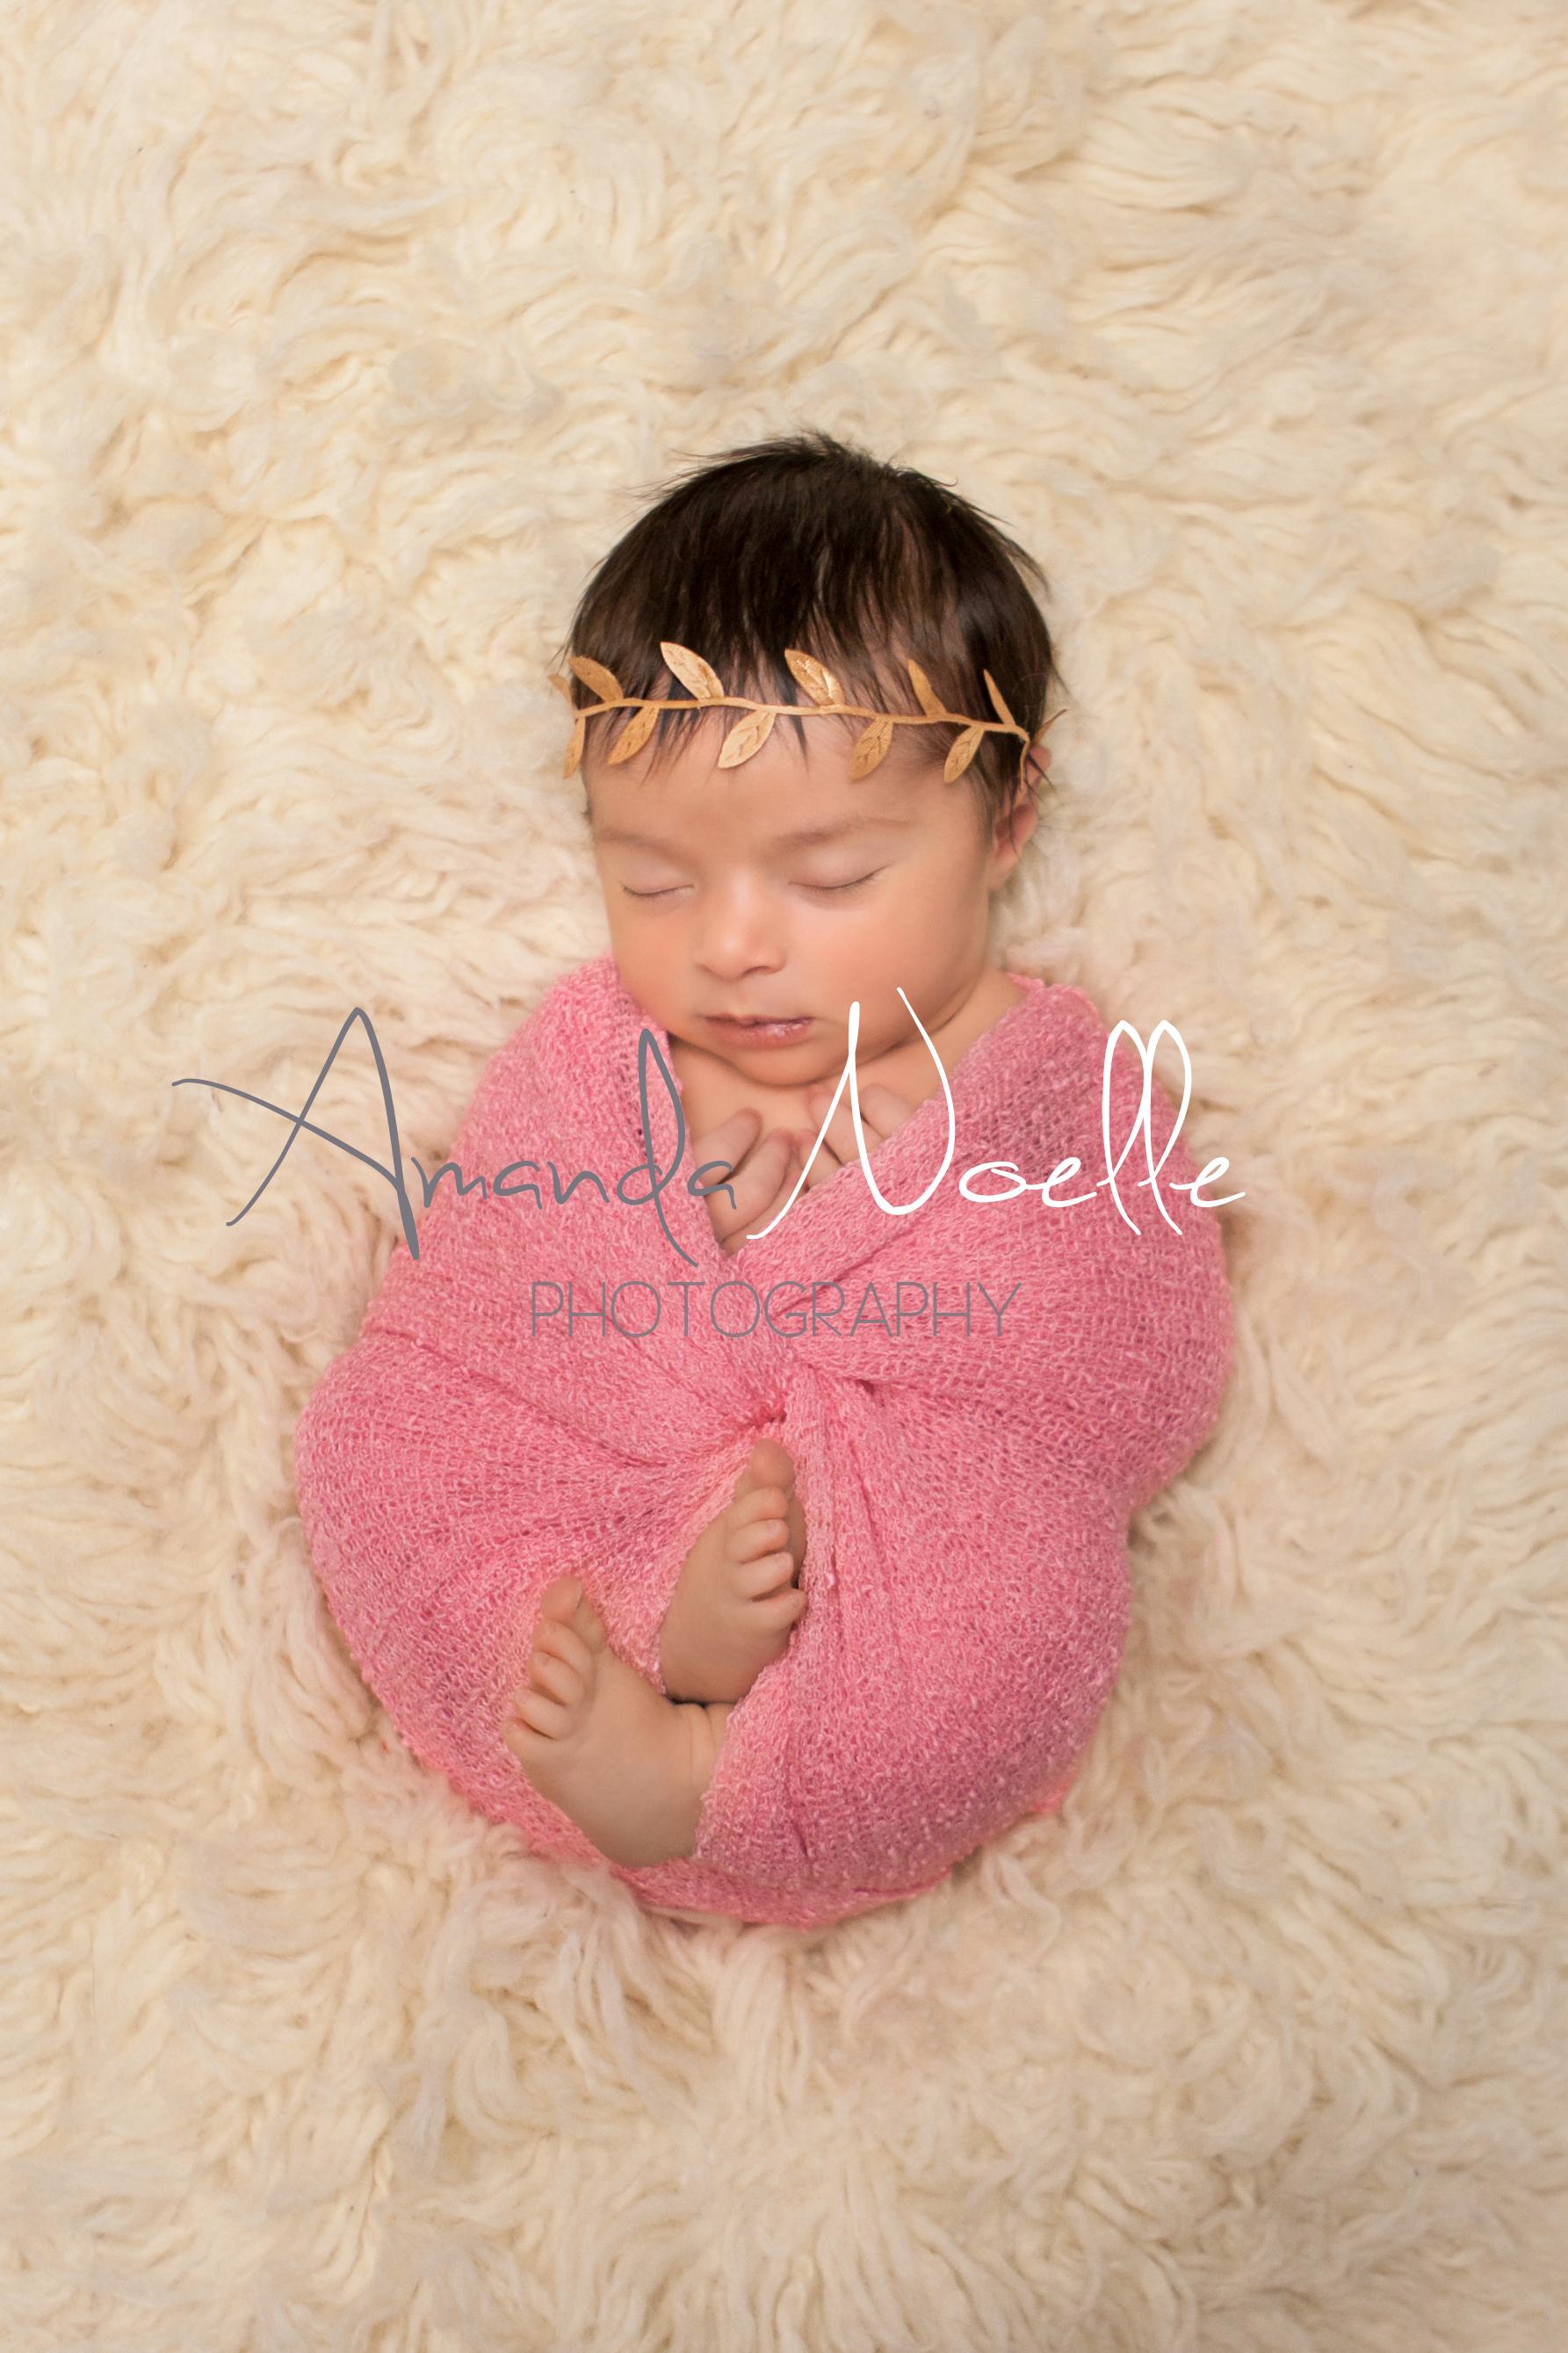 Newborn baby girl sleeping with gold leaf  headband wrapped in stretch knit pink wrap on cream creme flokati rug, Westchester, County New York Newborn Photographer, Amanda Noelle Photography.